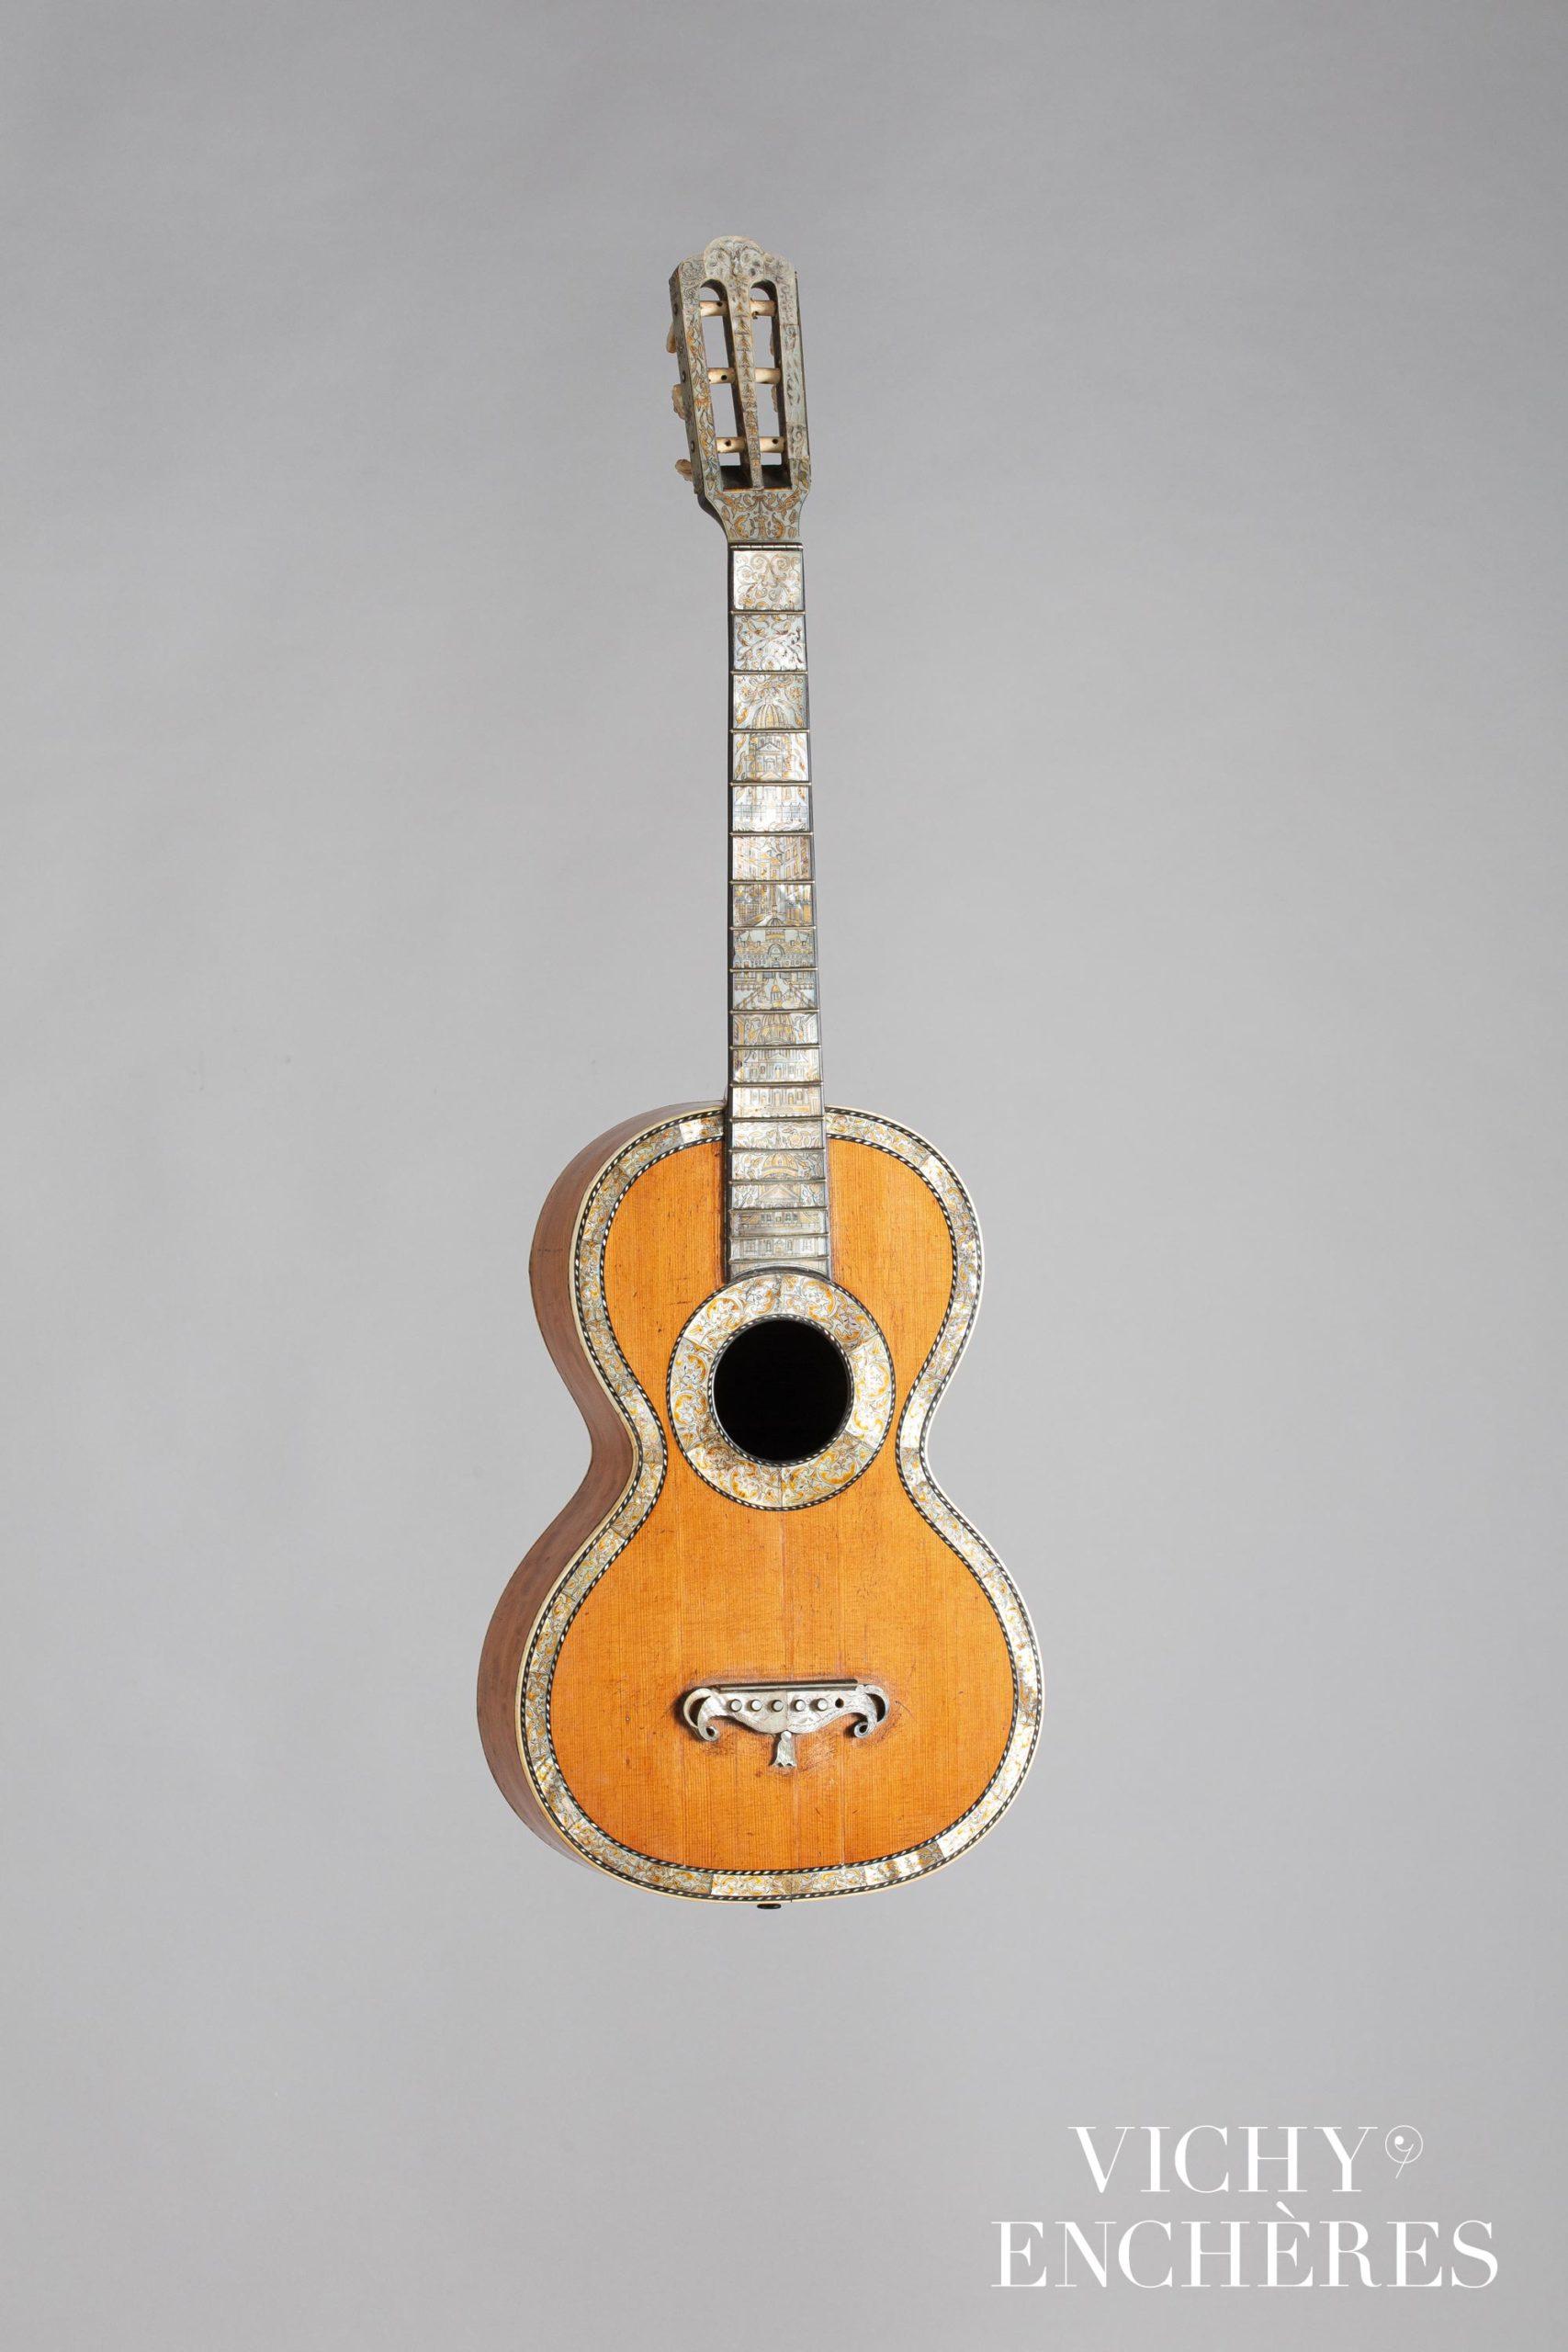 Guitare de AUBRY MAIRE vers 1840